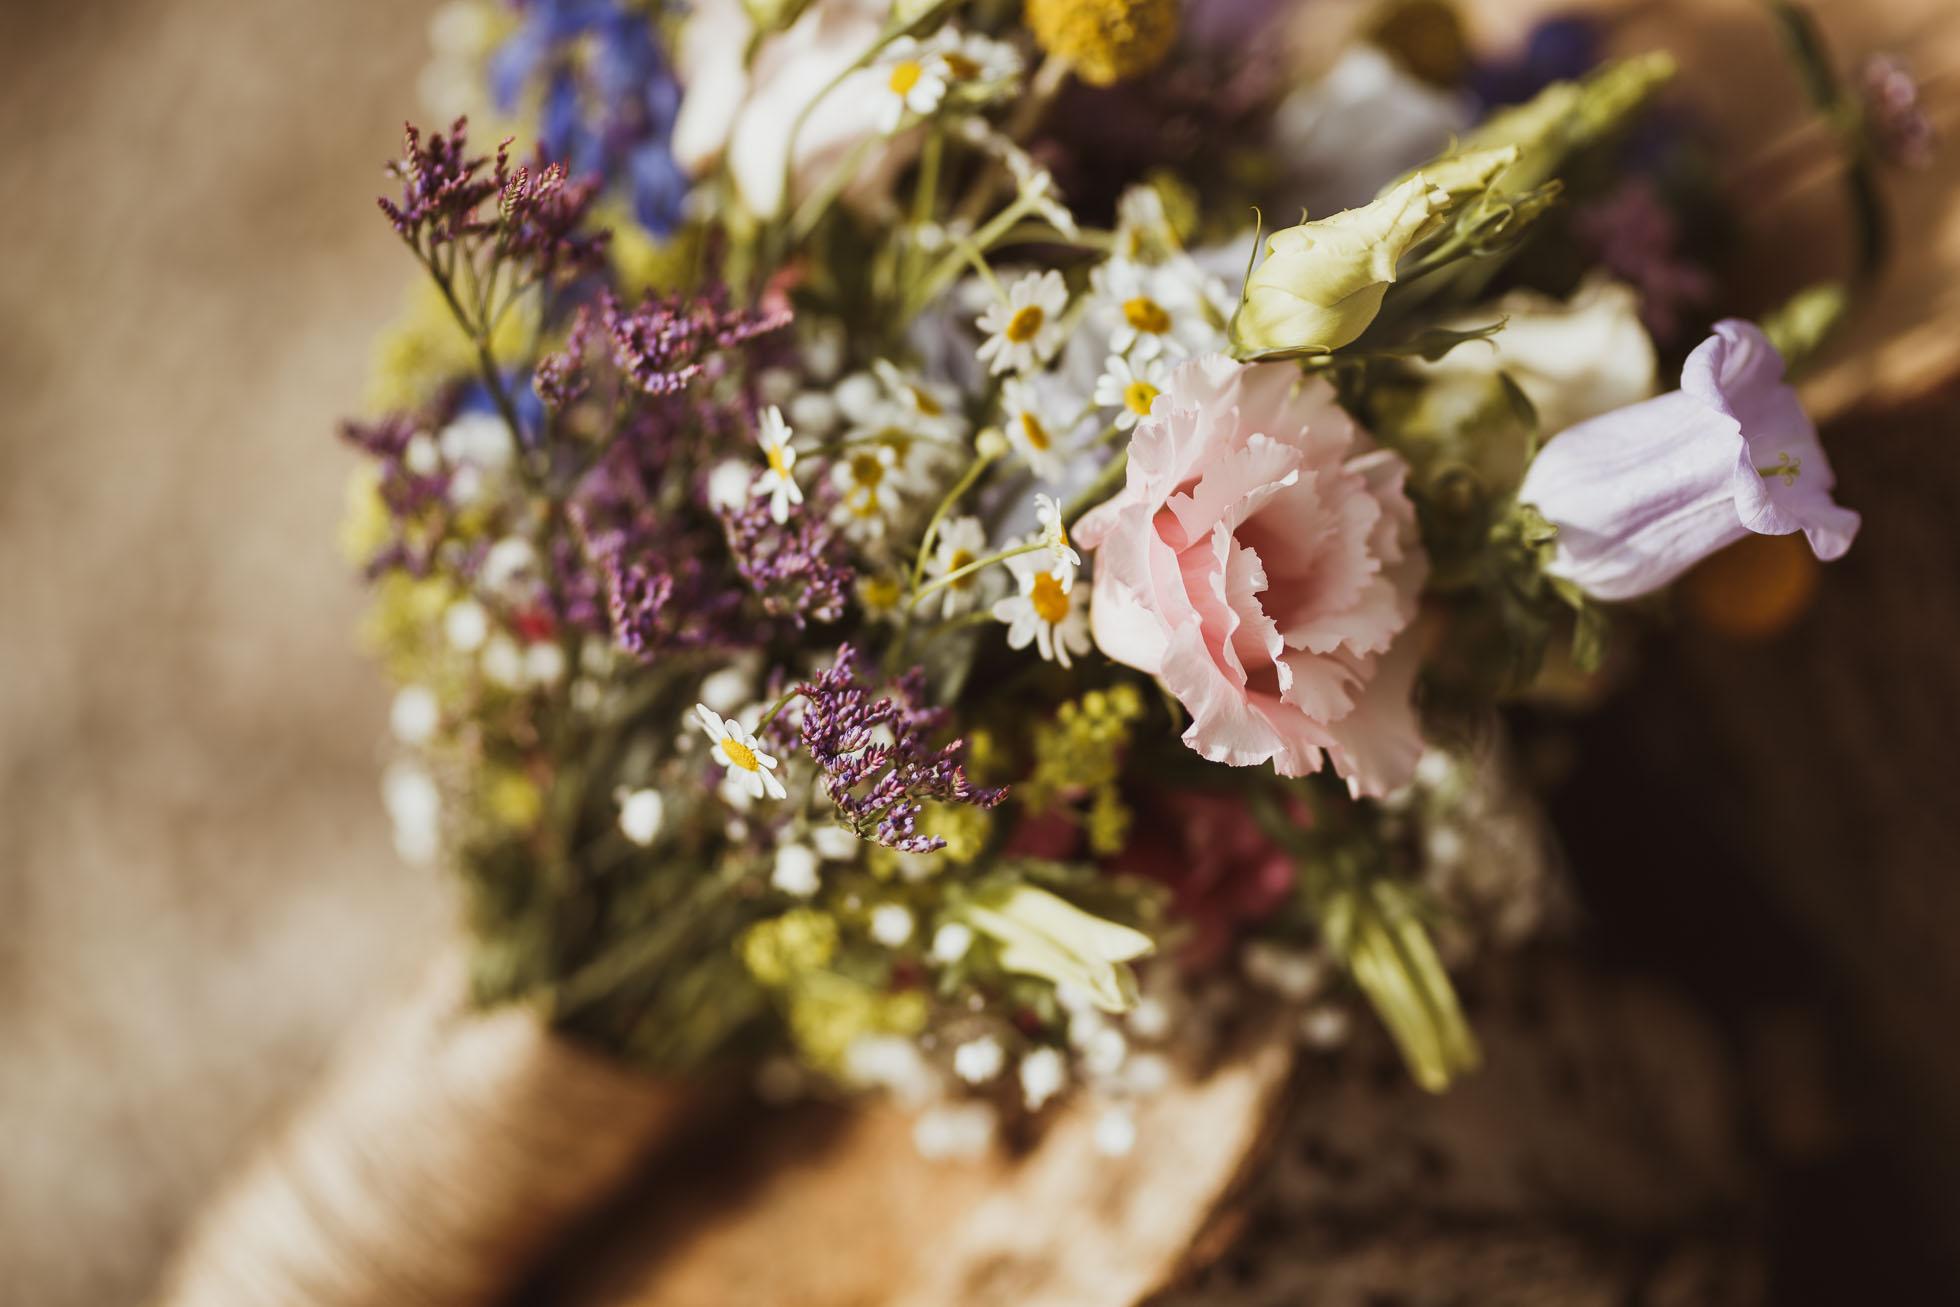 utrecht-wedding-photographer-45.jpg